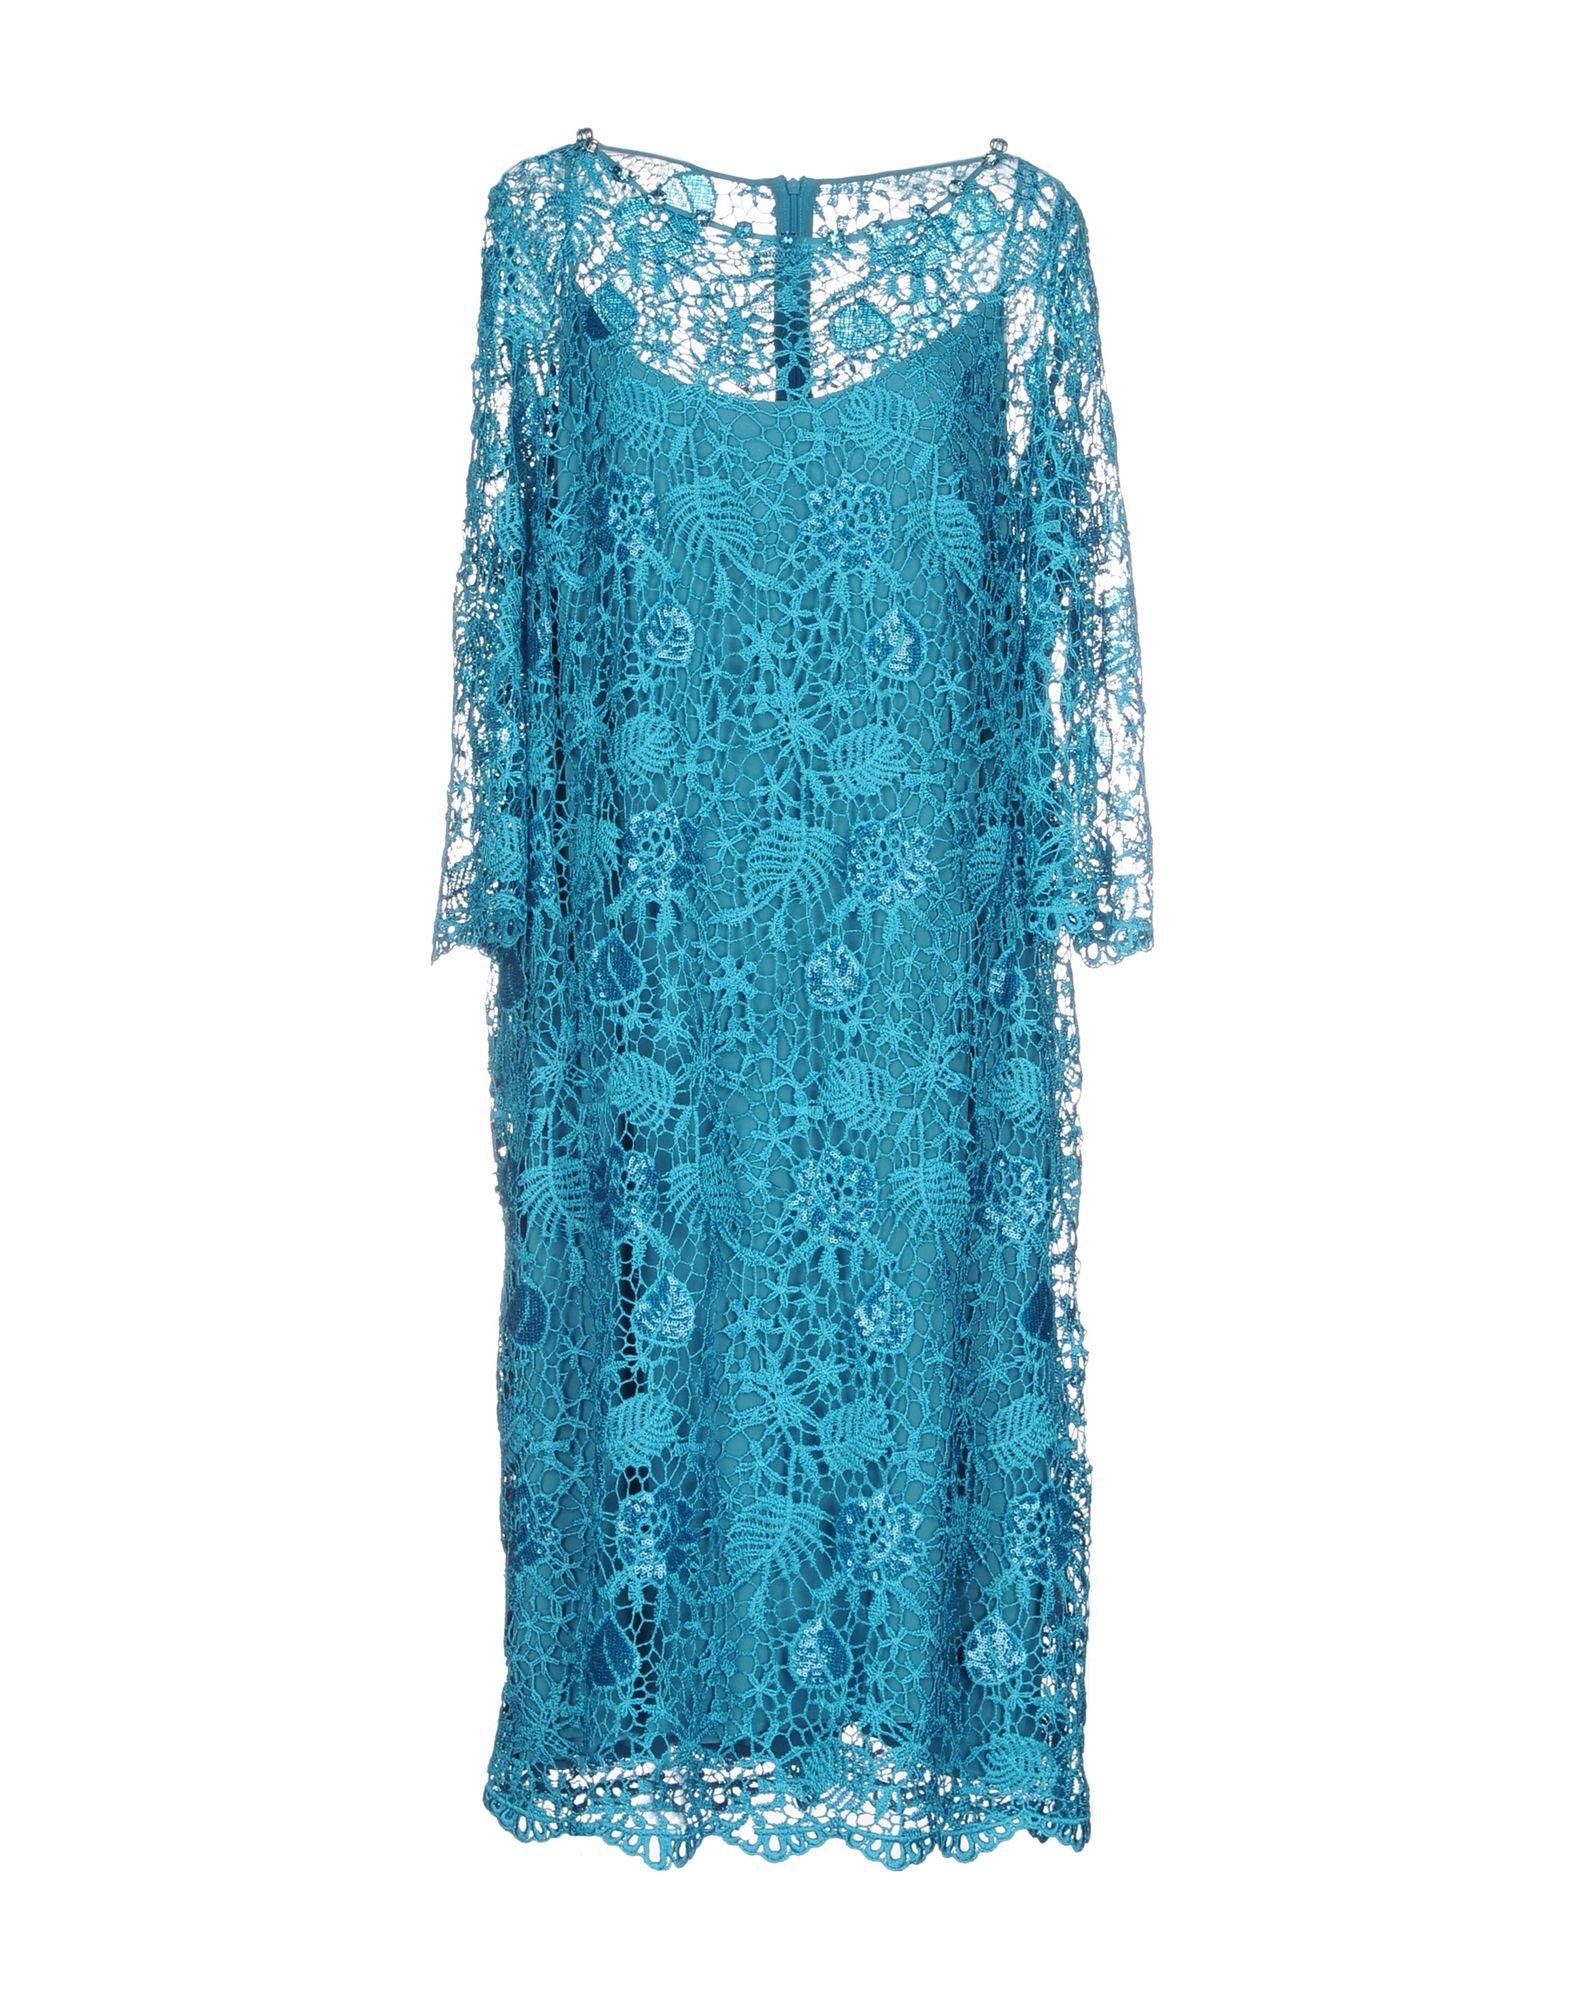 Gold KNEE-LENGTH DRESSES